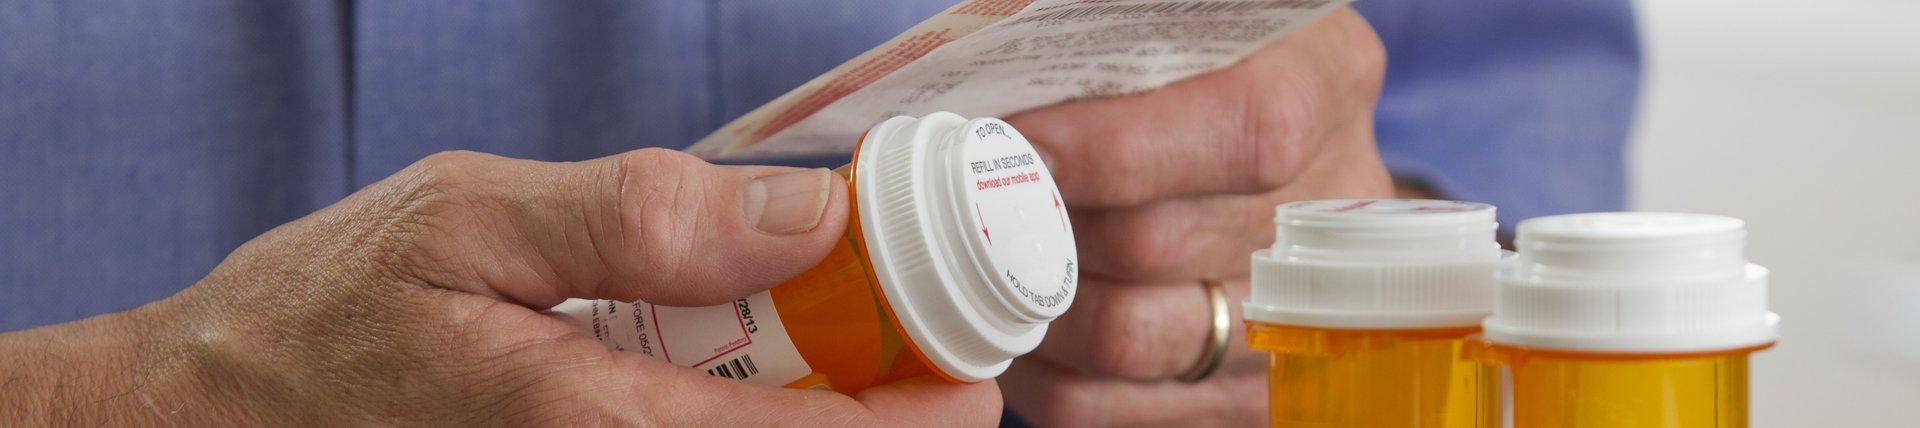 Prescription Wallet Cards - Minges Wellness Center